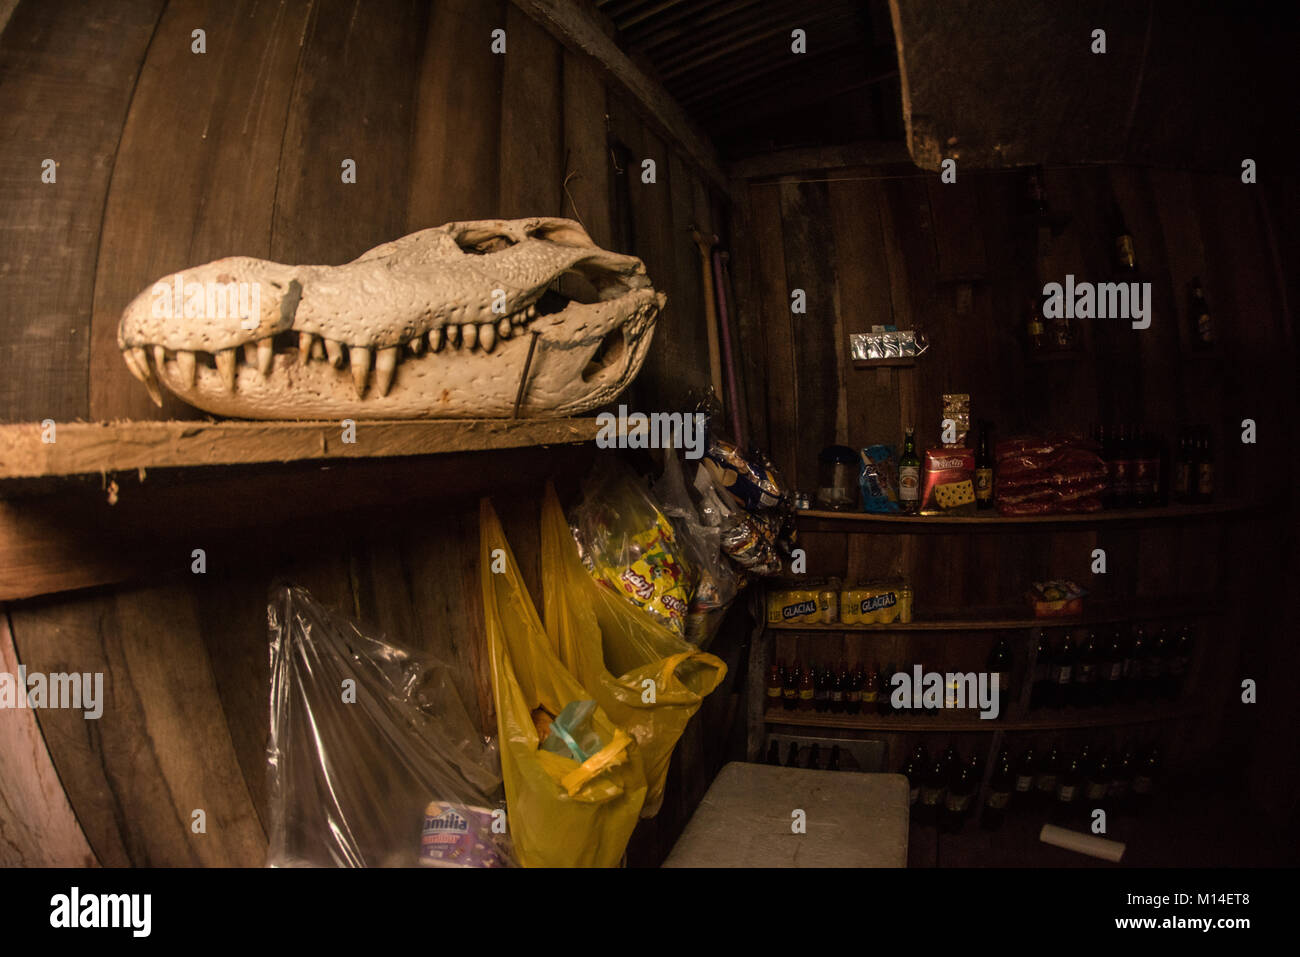 The skull of a black caiman (Melanosuchus niger) decorates a small convenience store in the Amazon basin. Stock Photo